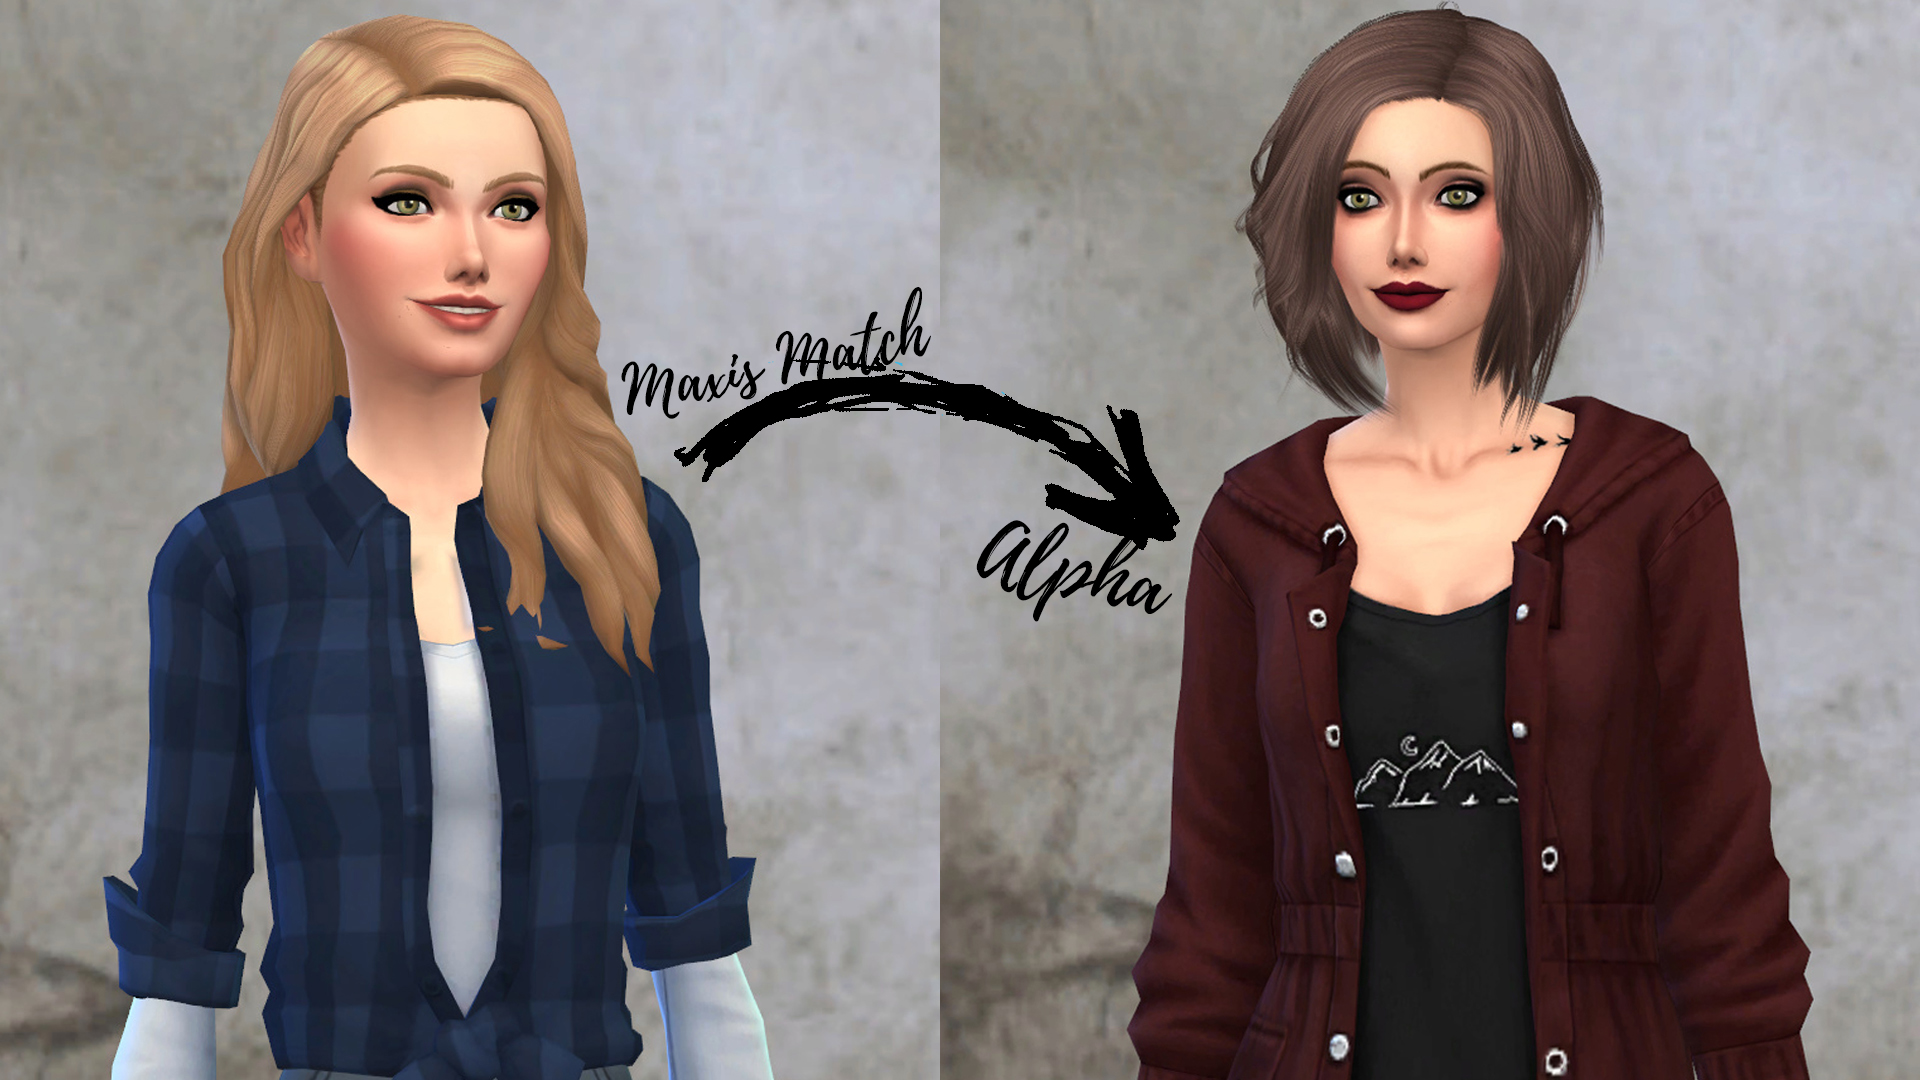 Sims 4 Maxis Match to Alpha CC Mae Polzine.jpg